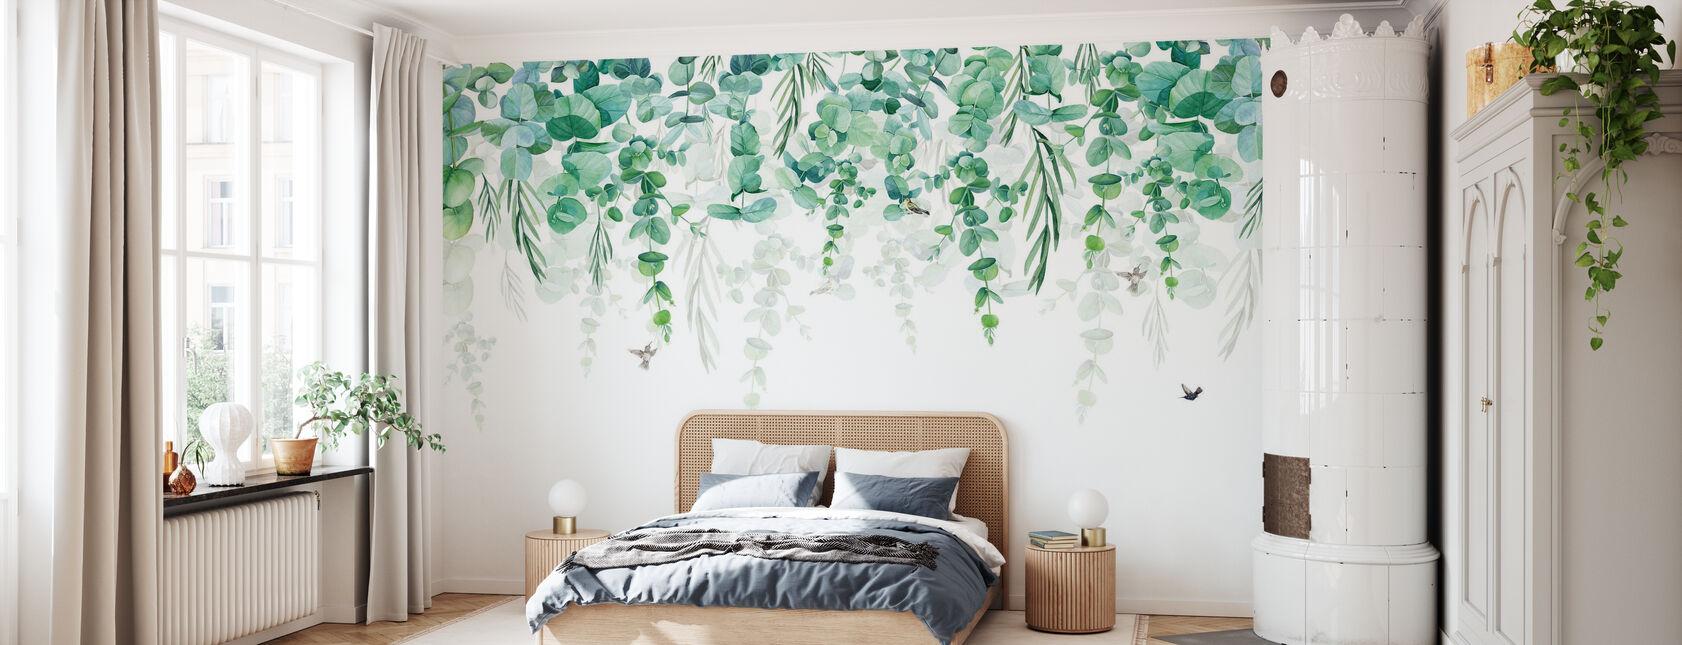 Greenery Drape - Wallpaper - Bedroom